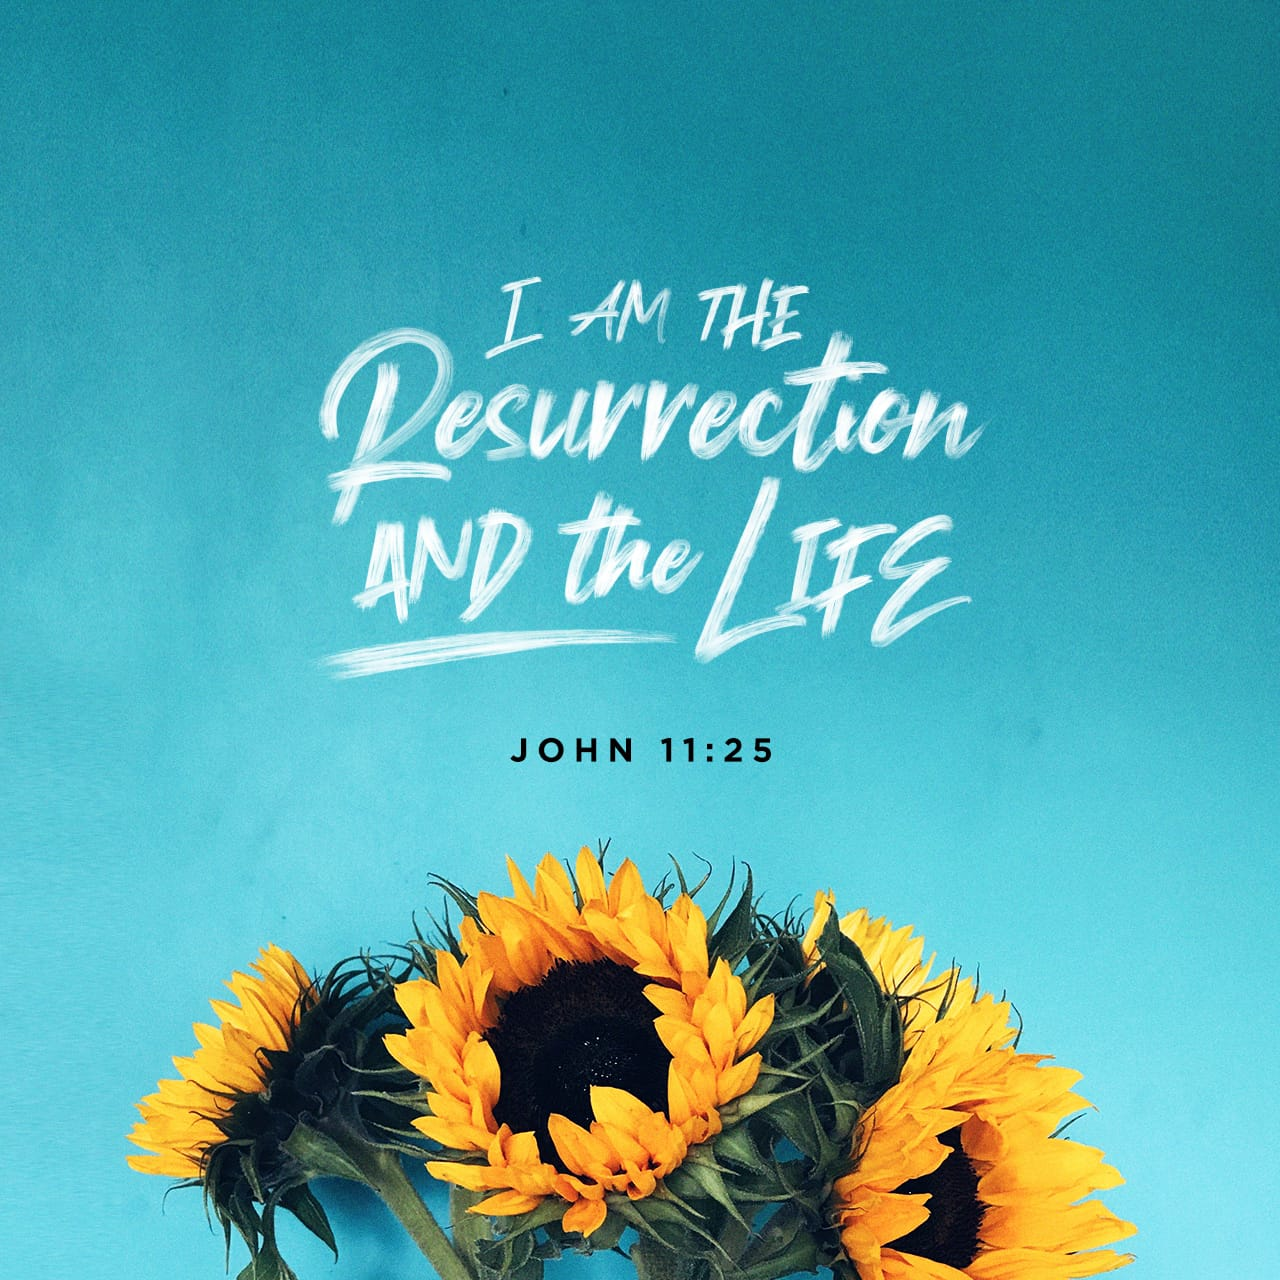 Verse Image for John 11:25